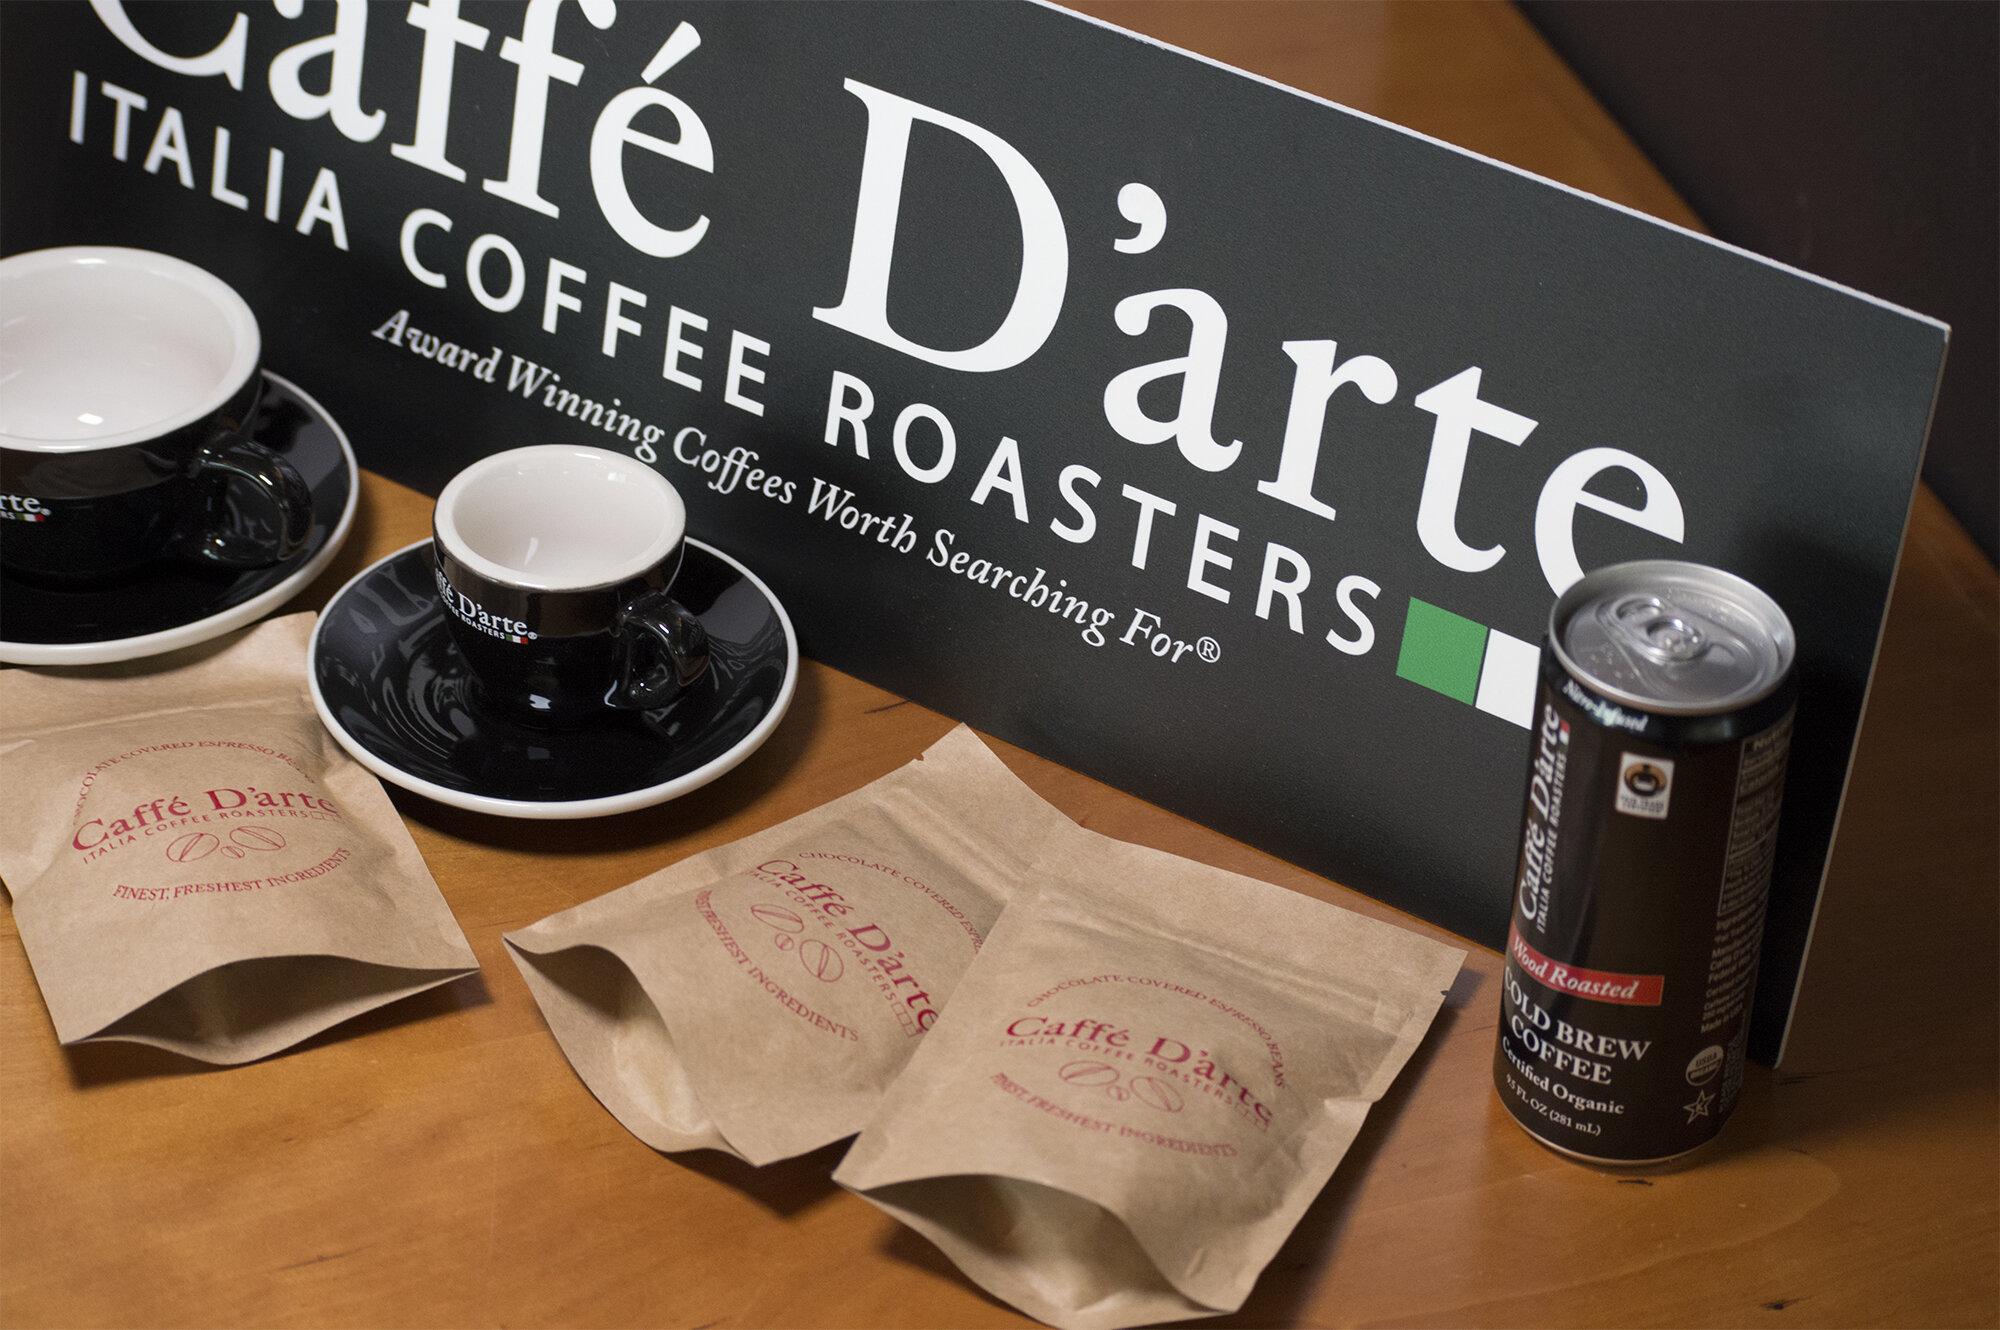 caffee_items_reduced.jpg